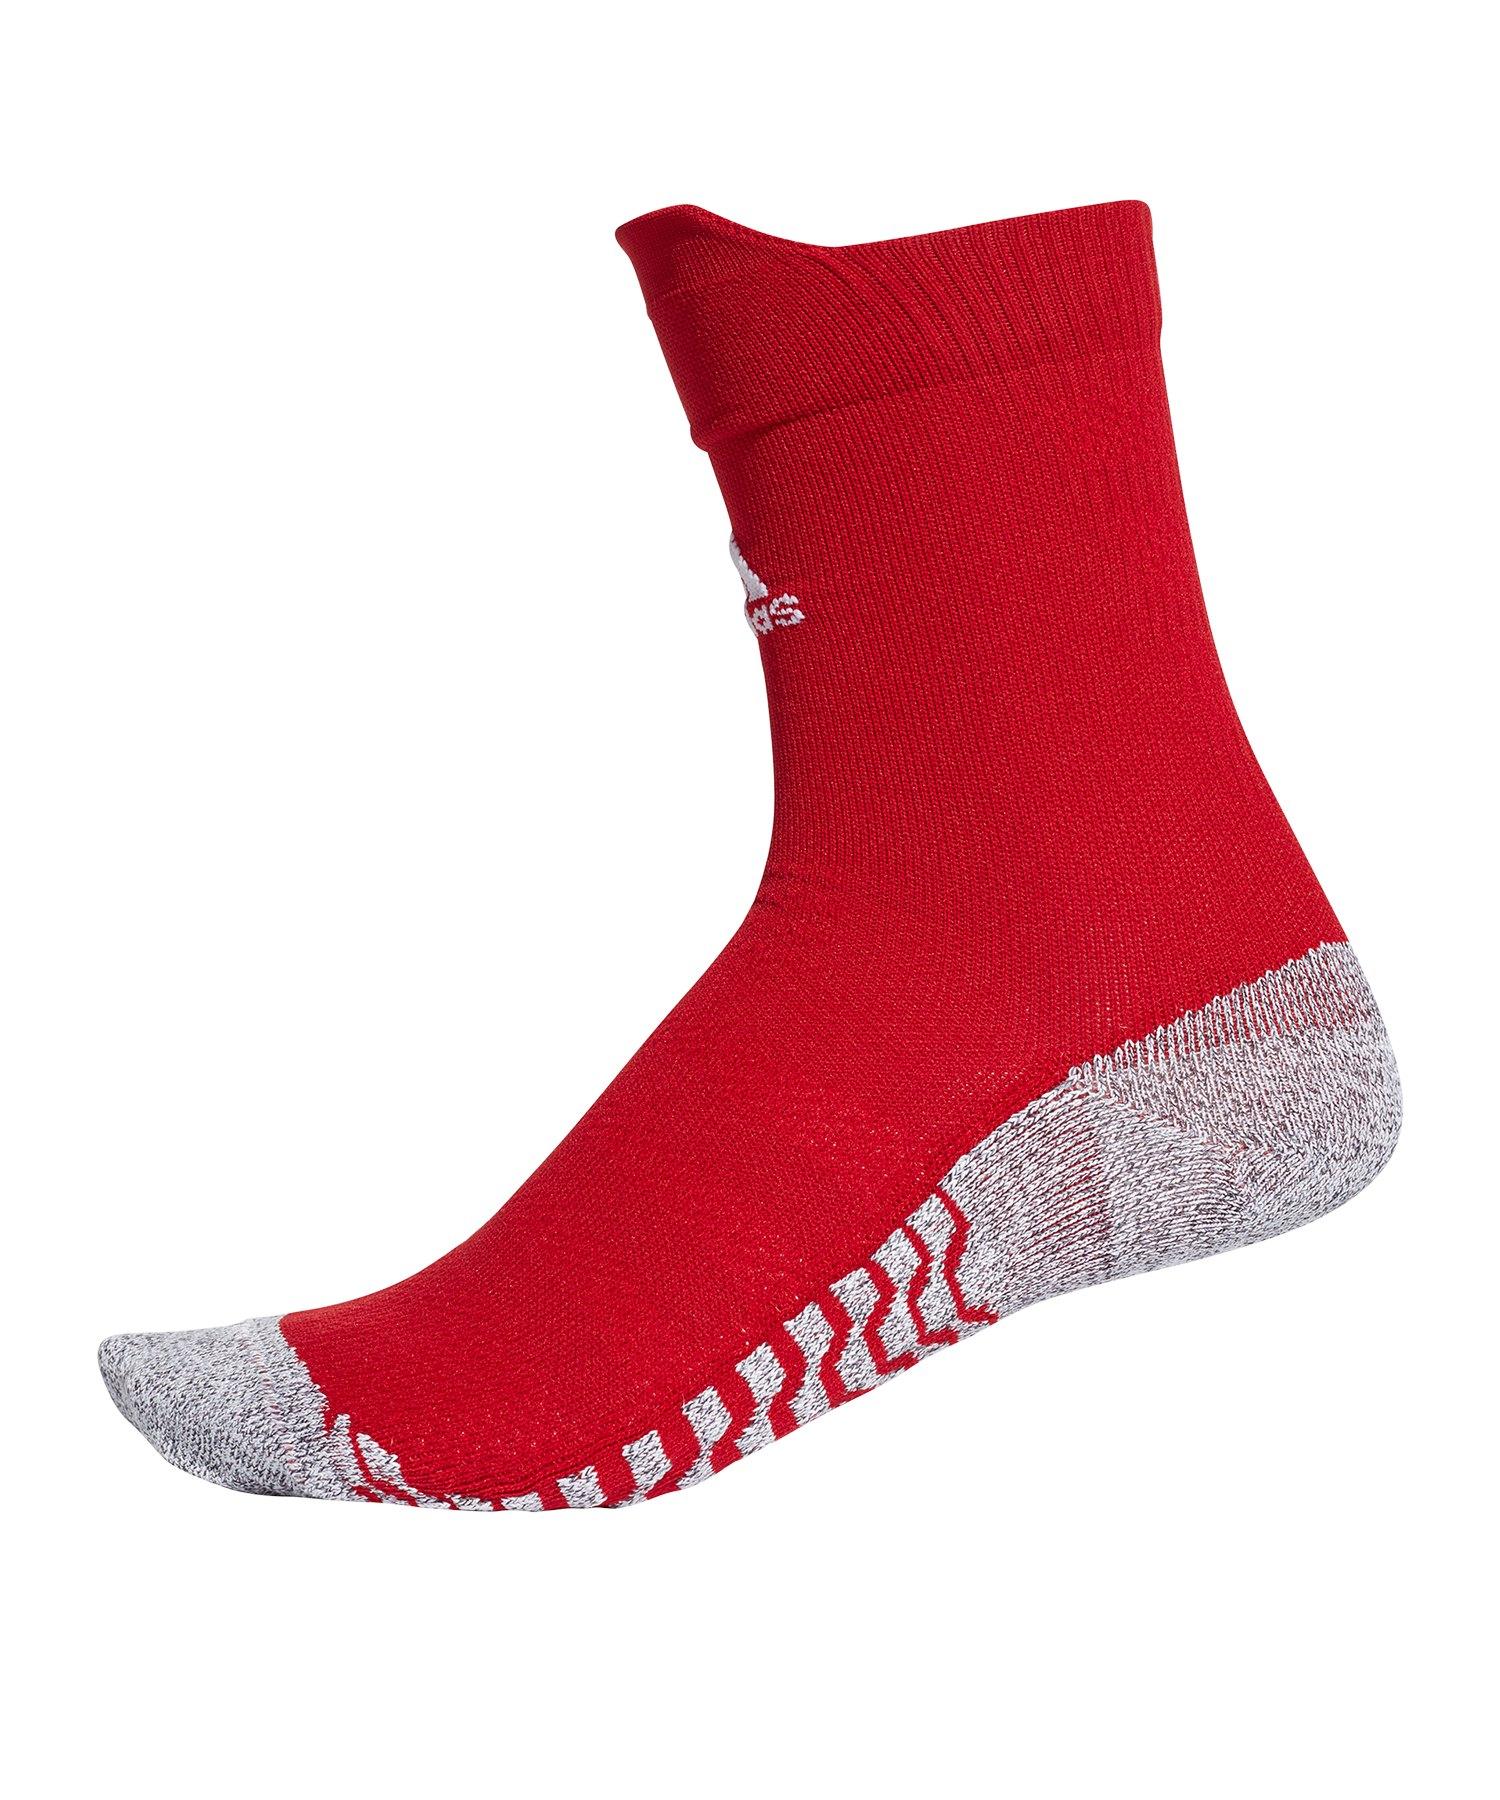 adidas Alphaskin Traxion Crew UL Socken Rot Weiss - rot